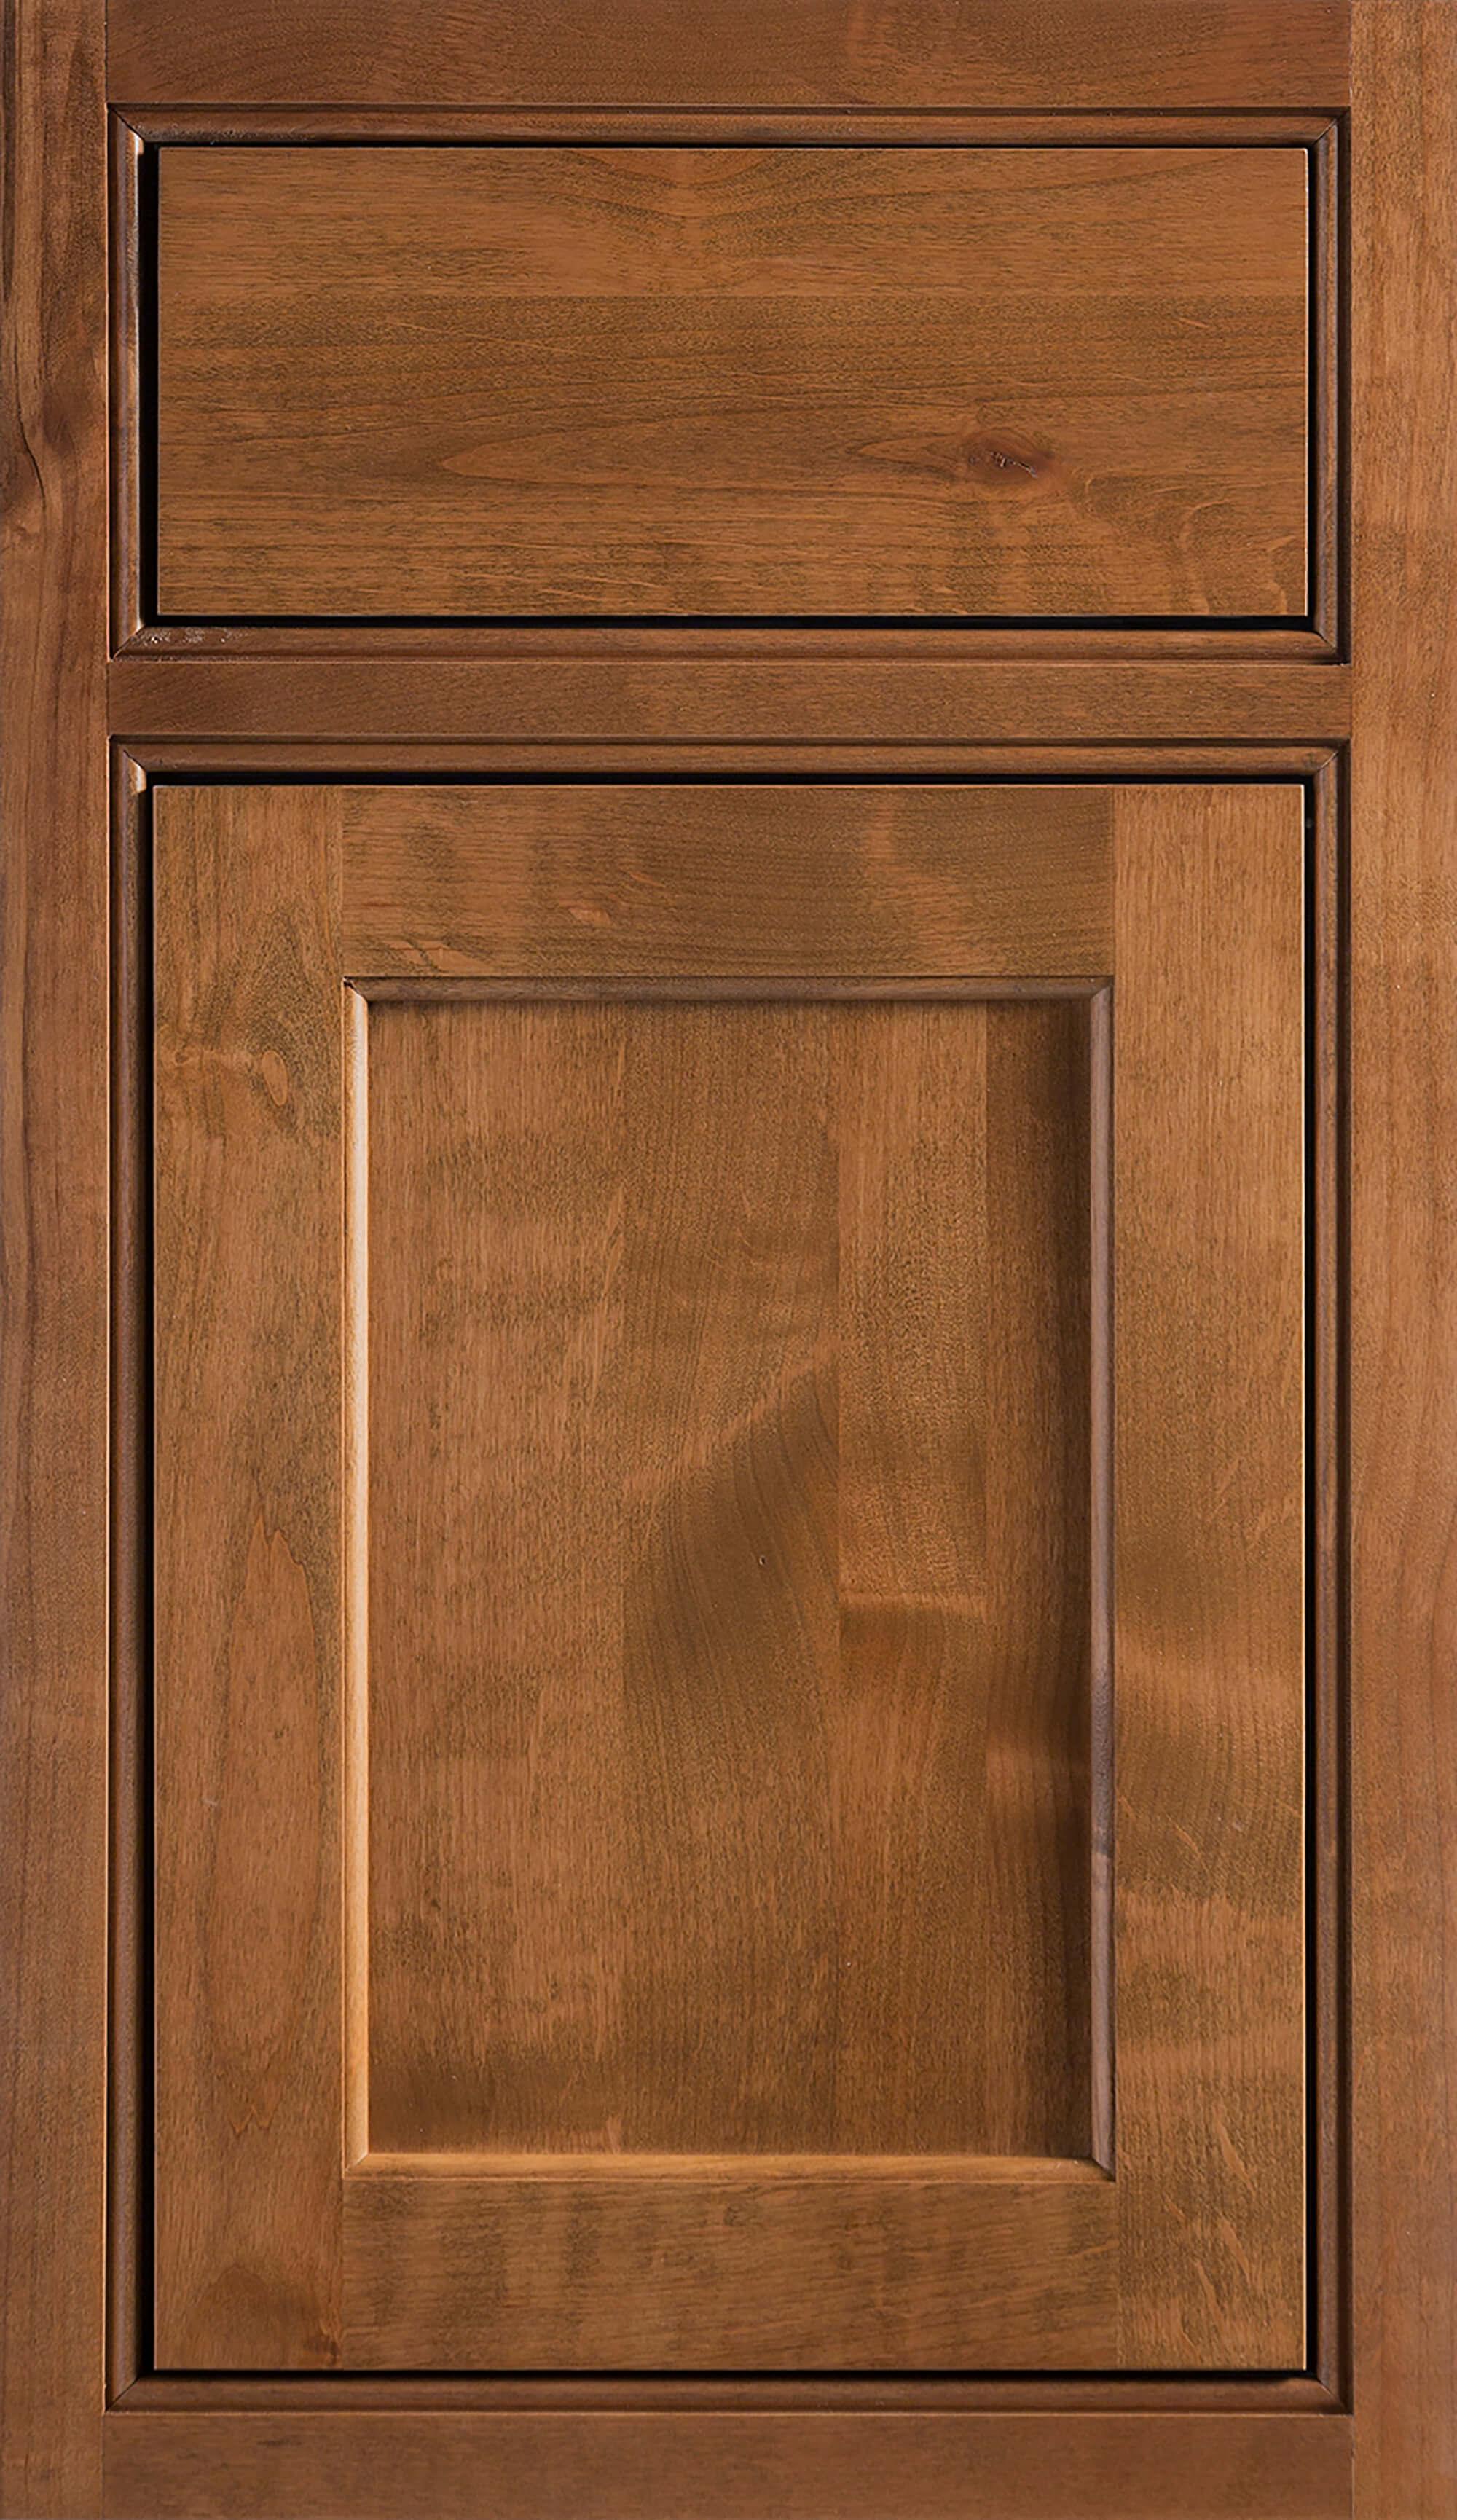 Arcadia Panel/Kendall Panel - Inset